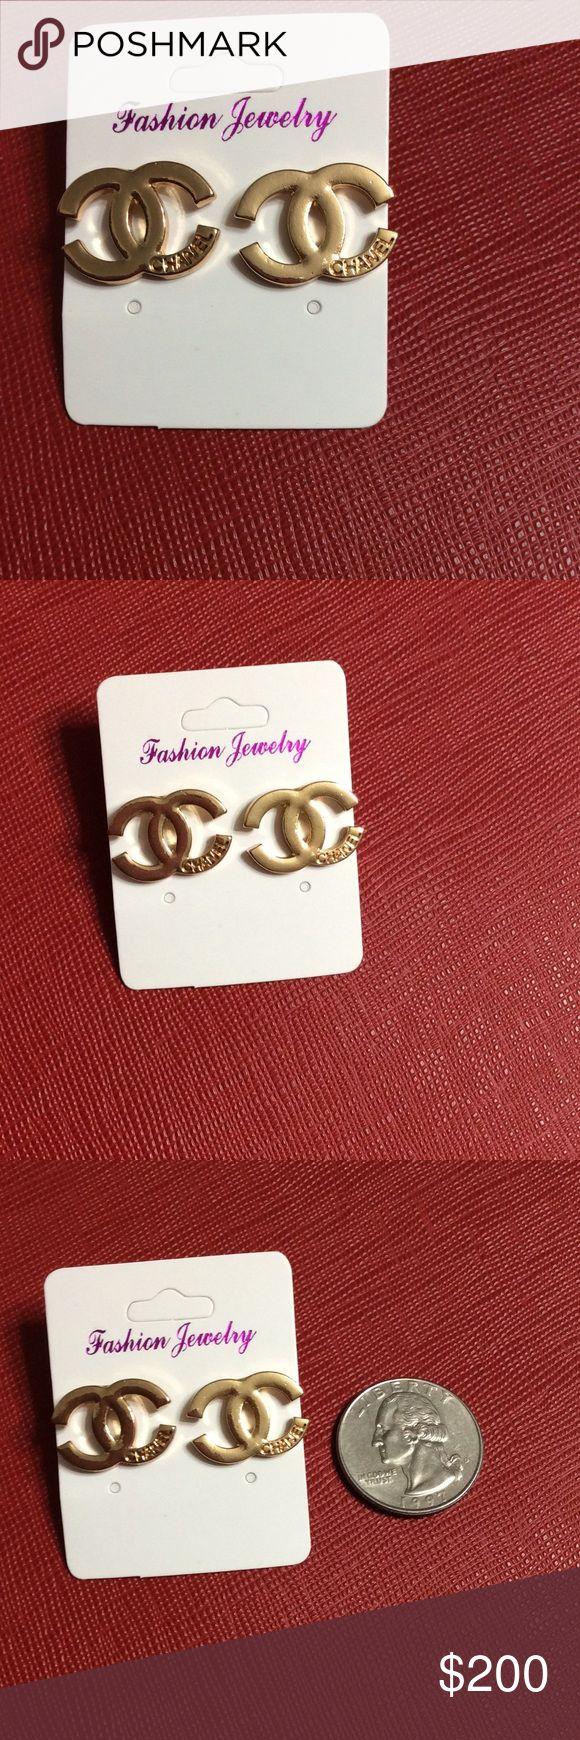 CC earrings Brand new gold earrings. Not real Chanel. Price is firm CHANEL Jewelry Earrings